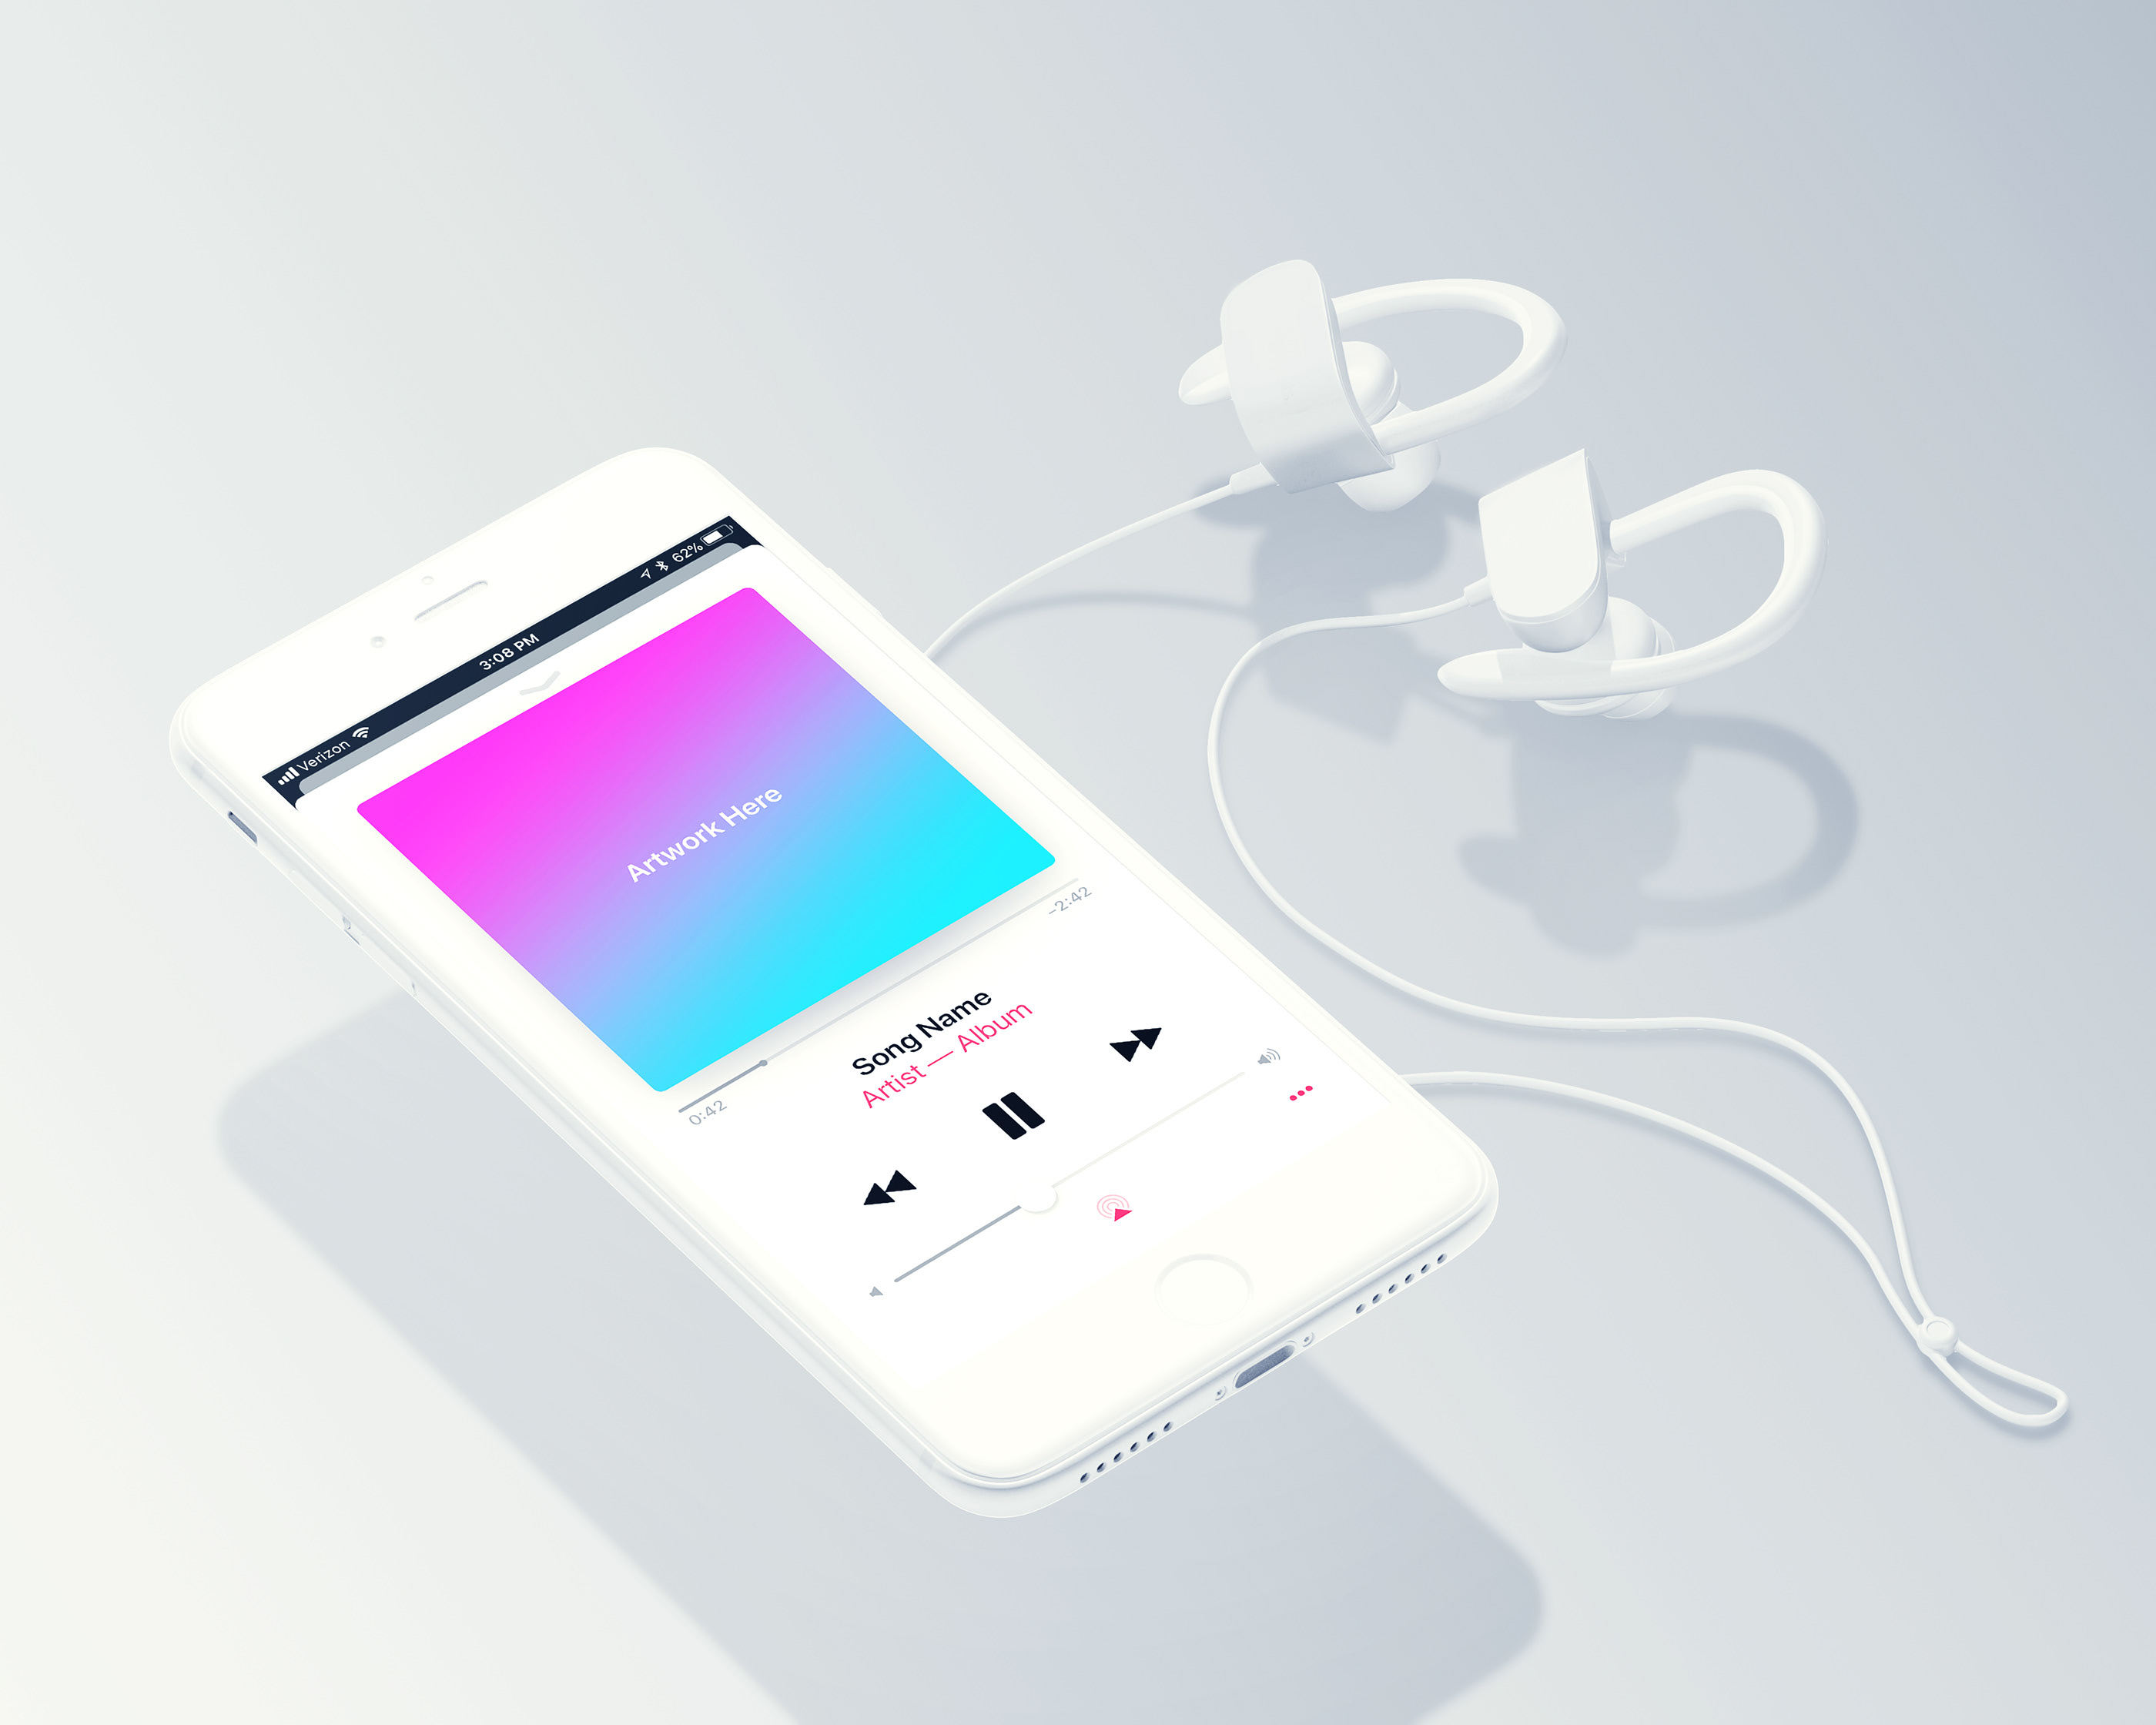 Free Spotify & Apple Music Mockup on Behance